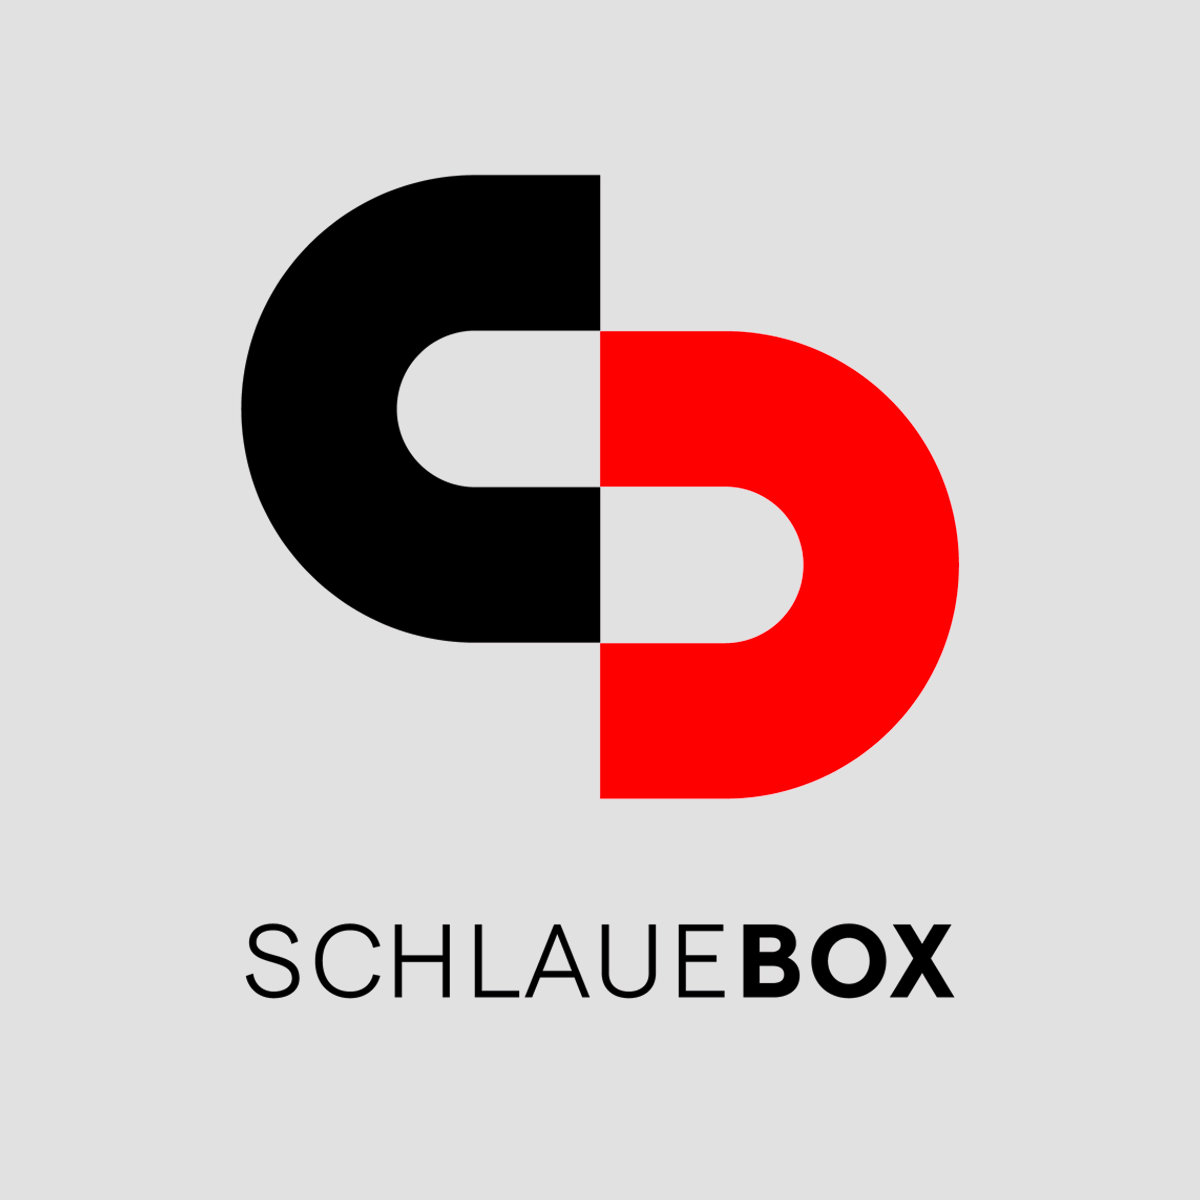 SCVB_Logo_SchlaueBox_1200x1200px